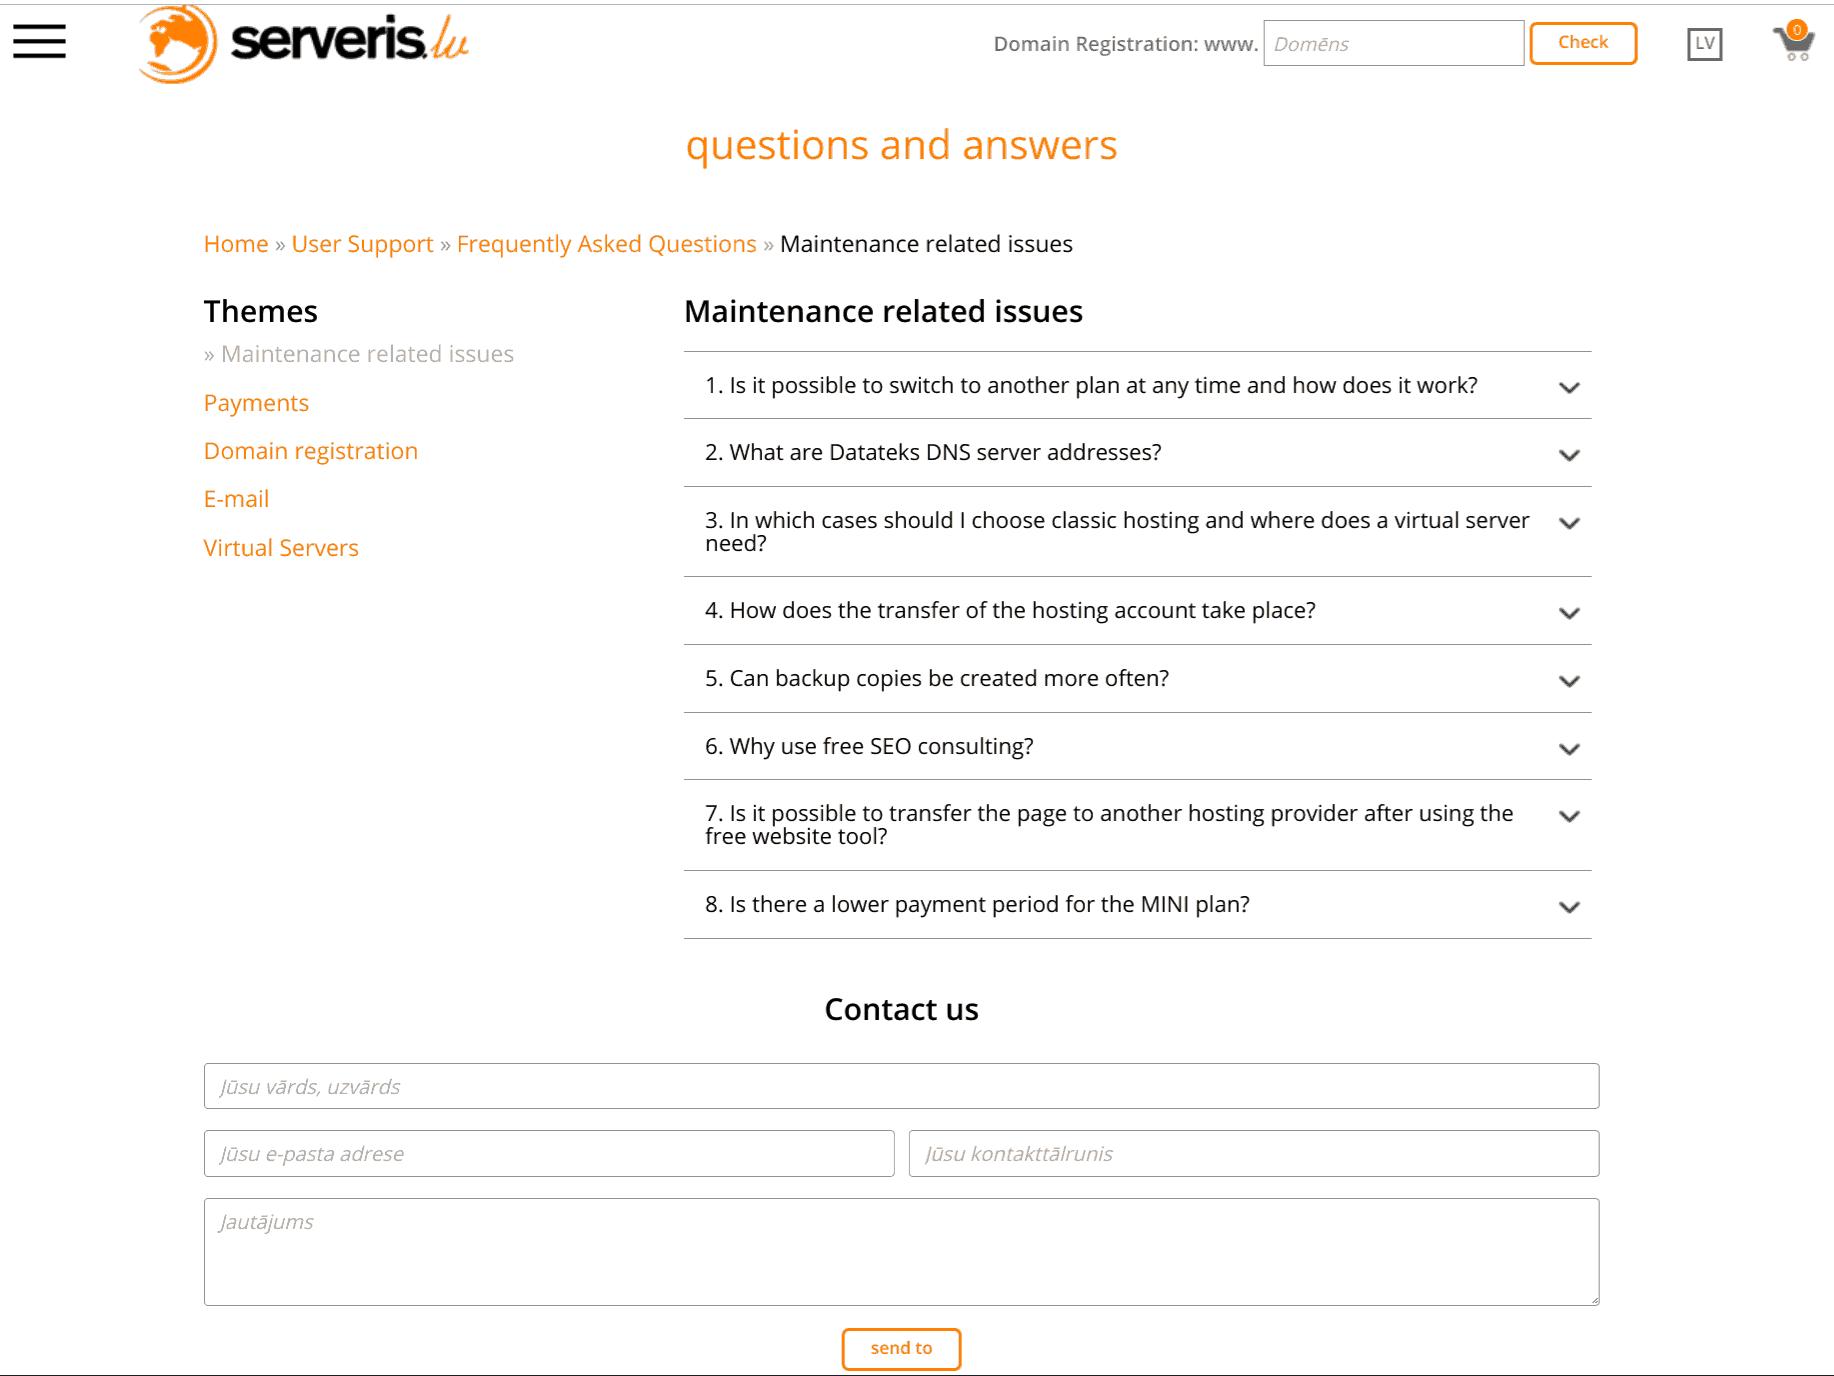 Serveris.lv-overview2